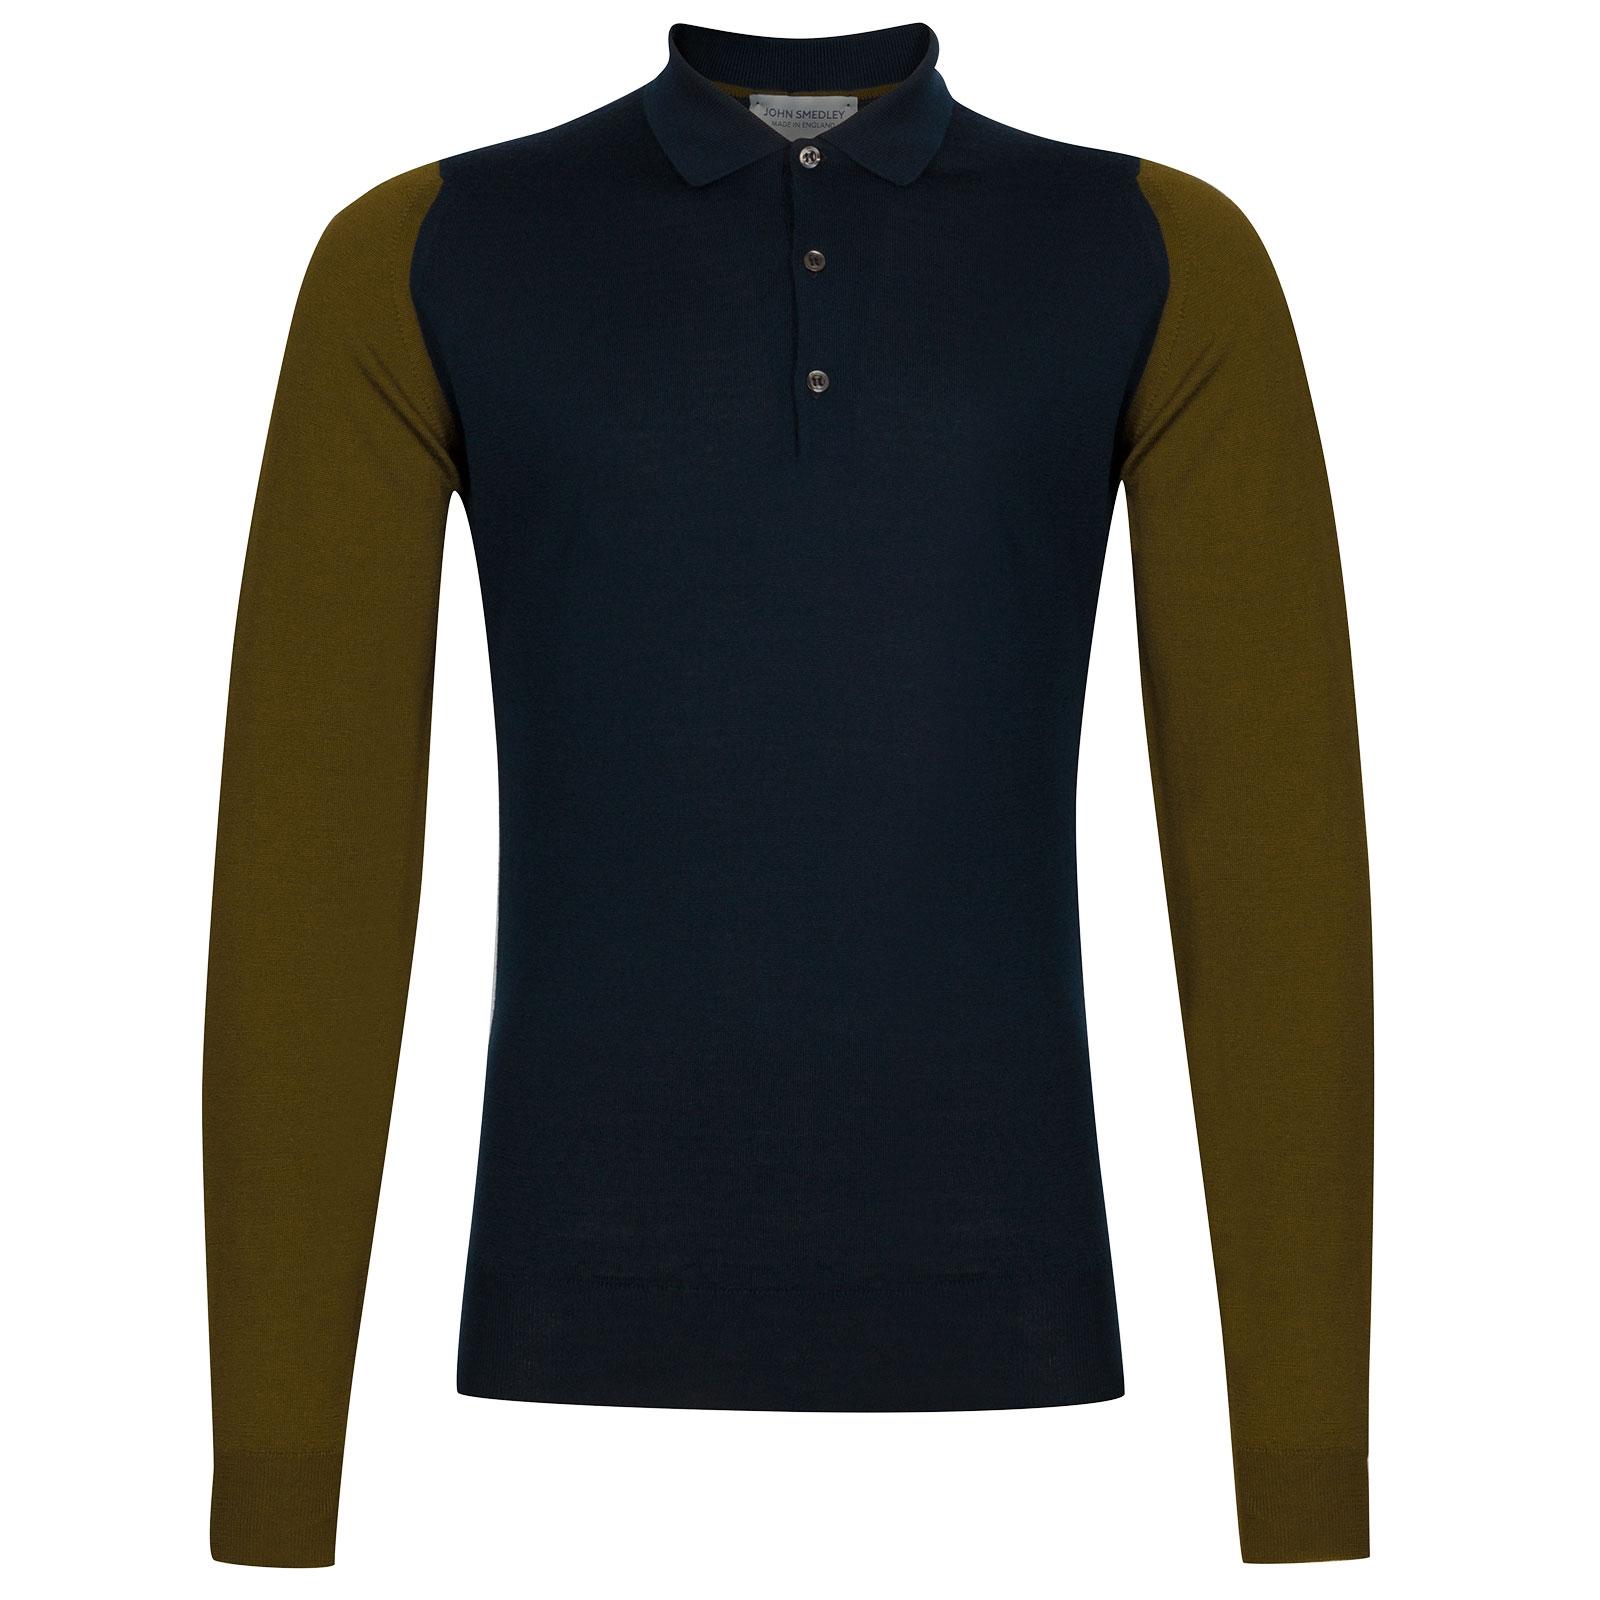 John Smedley Brightgate Extra Fine Merino Shirt in Silver-M